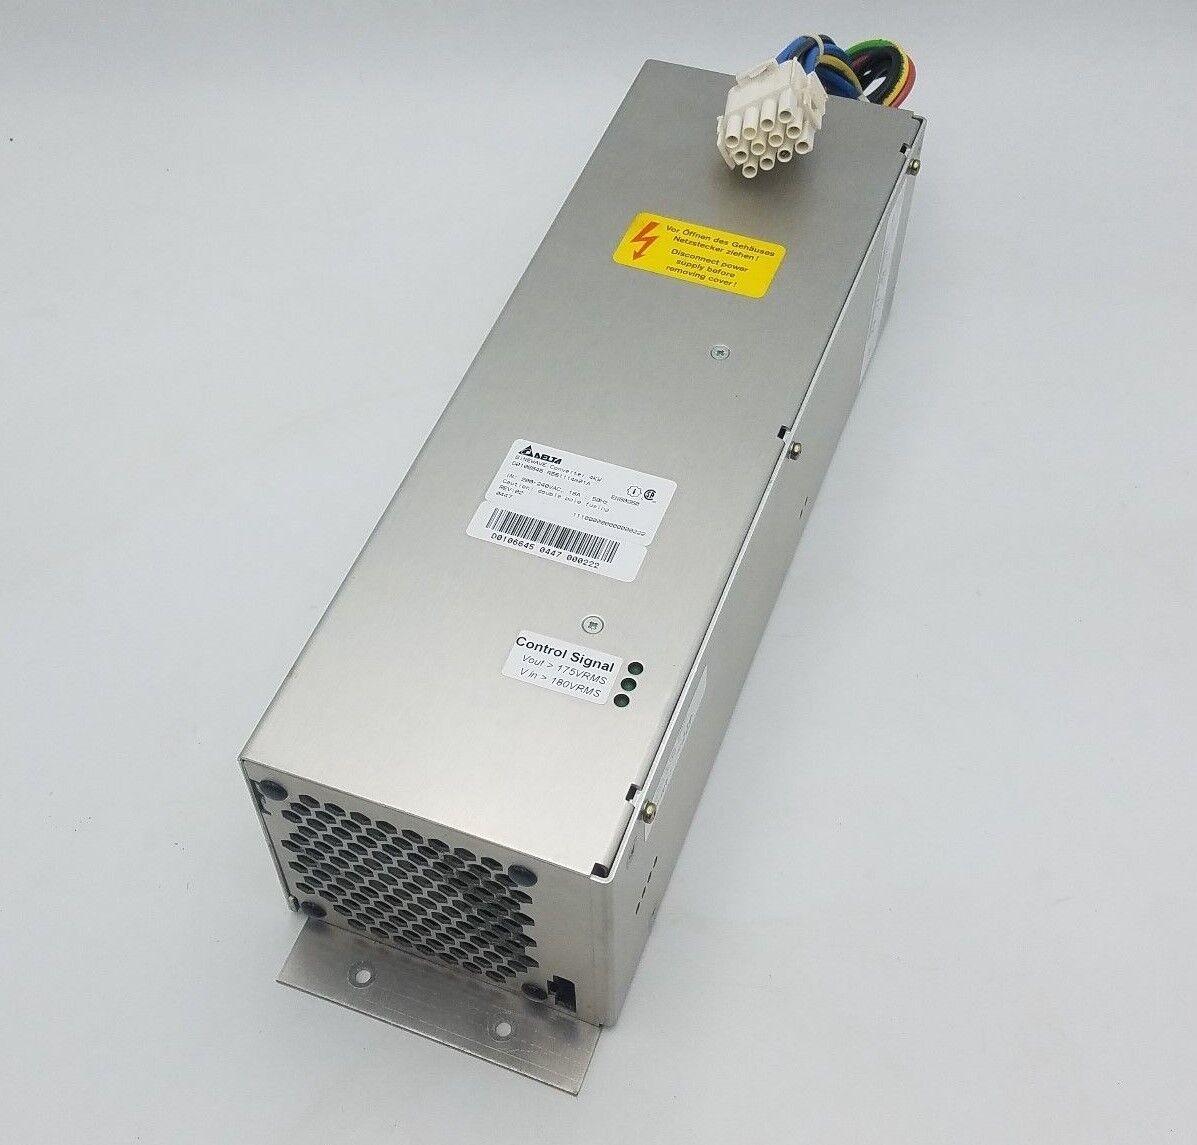 Delta D0106645 Sineware Congreener 4kw 200-240V 18A Rev 02 50Hz R561114m01A Used